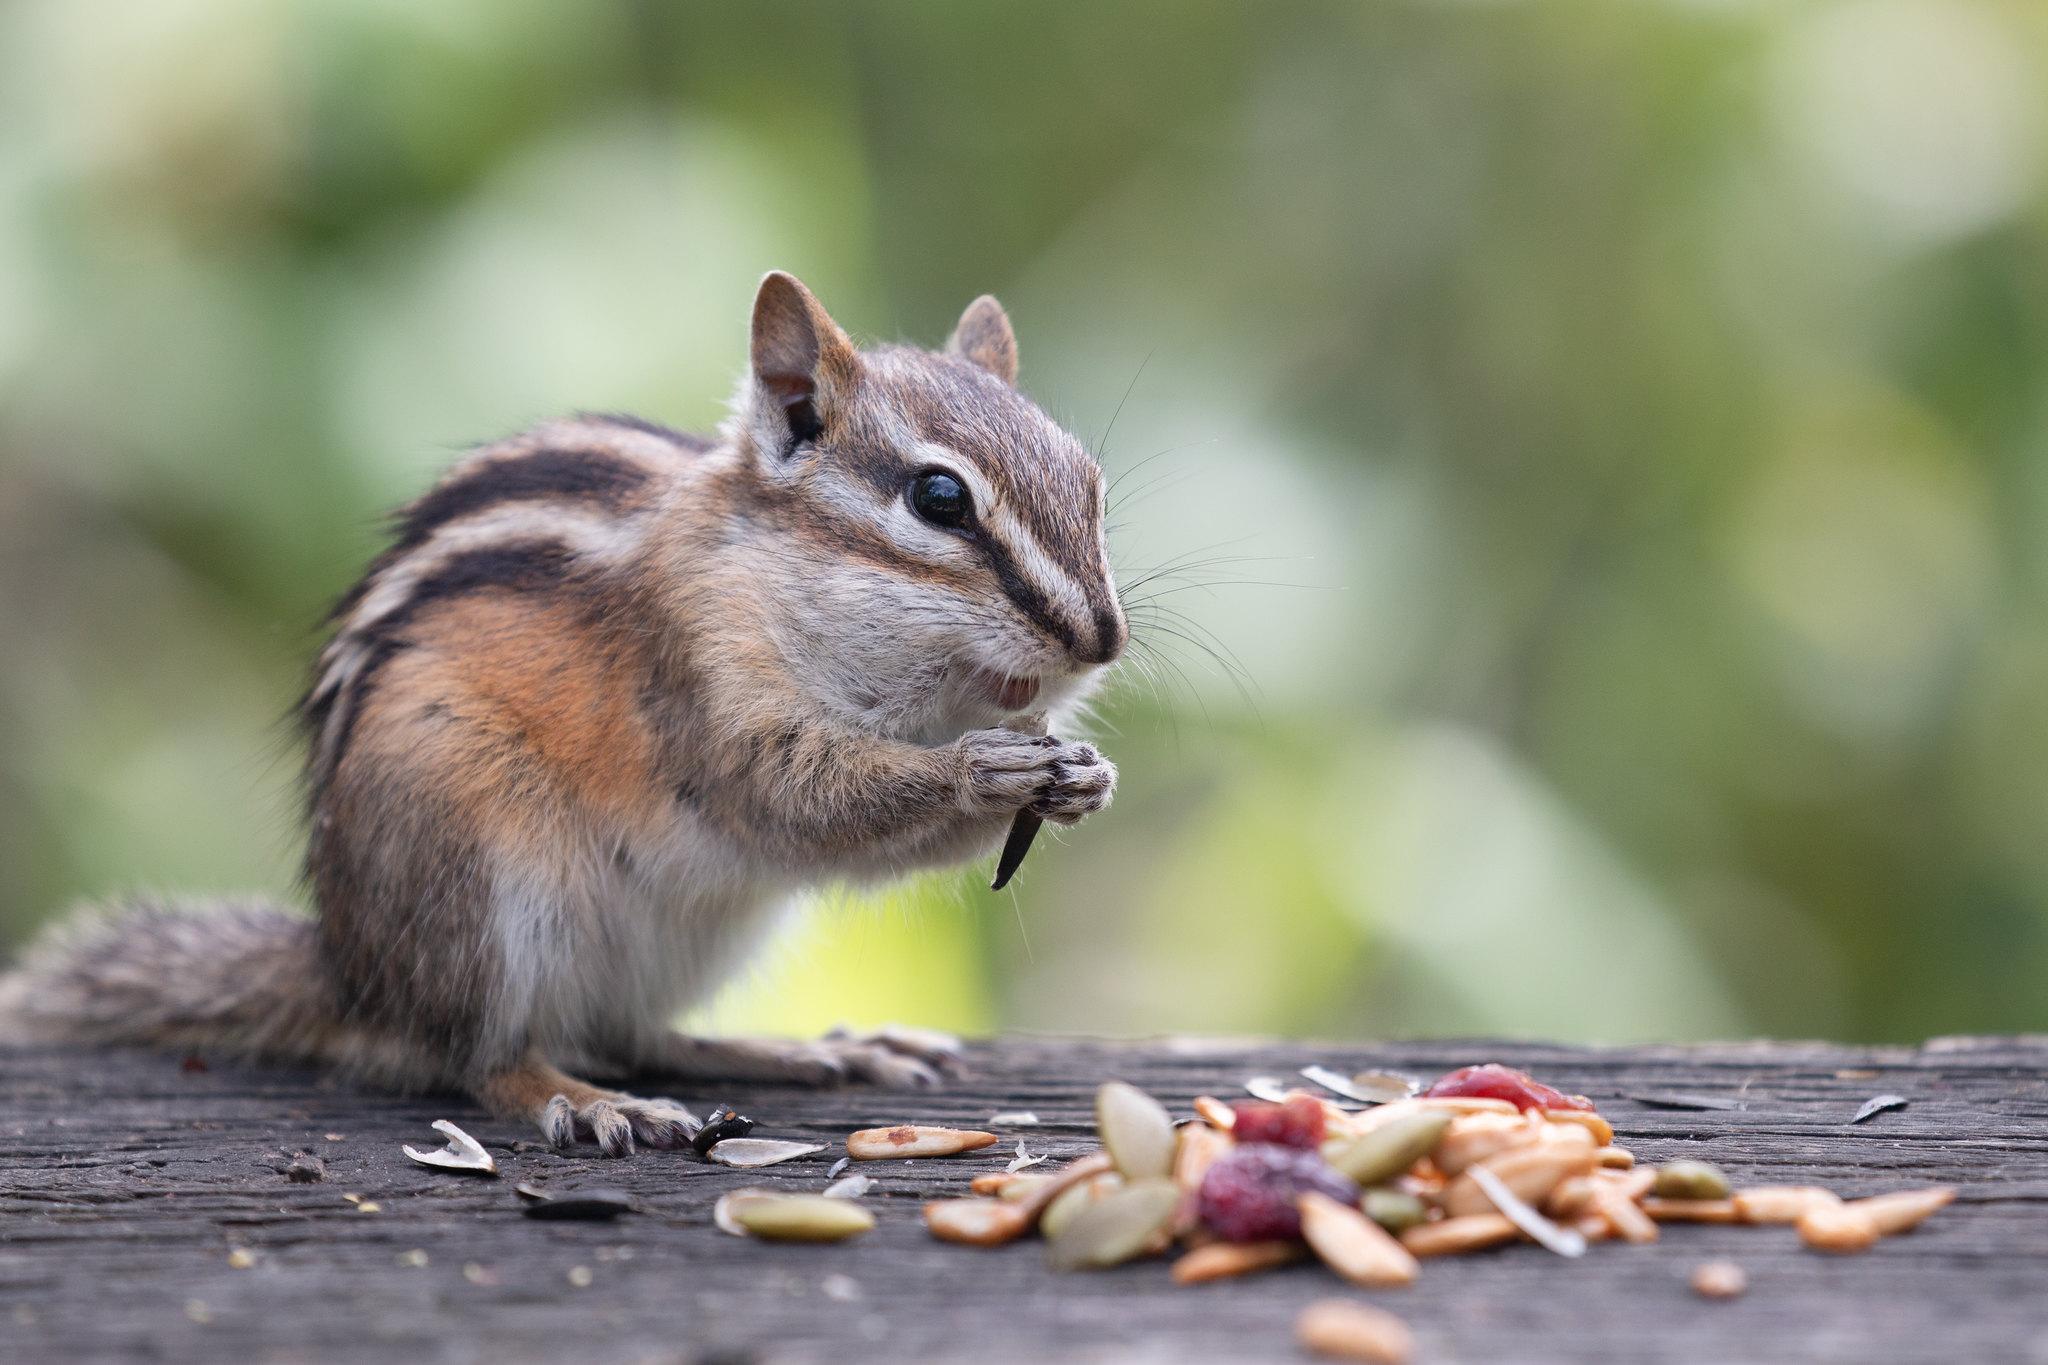 Happy Chipmunk (SOTC 364/365)